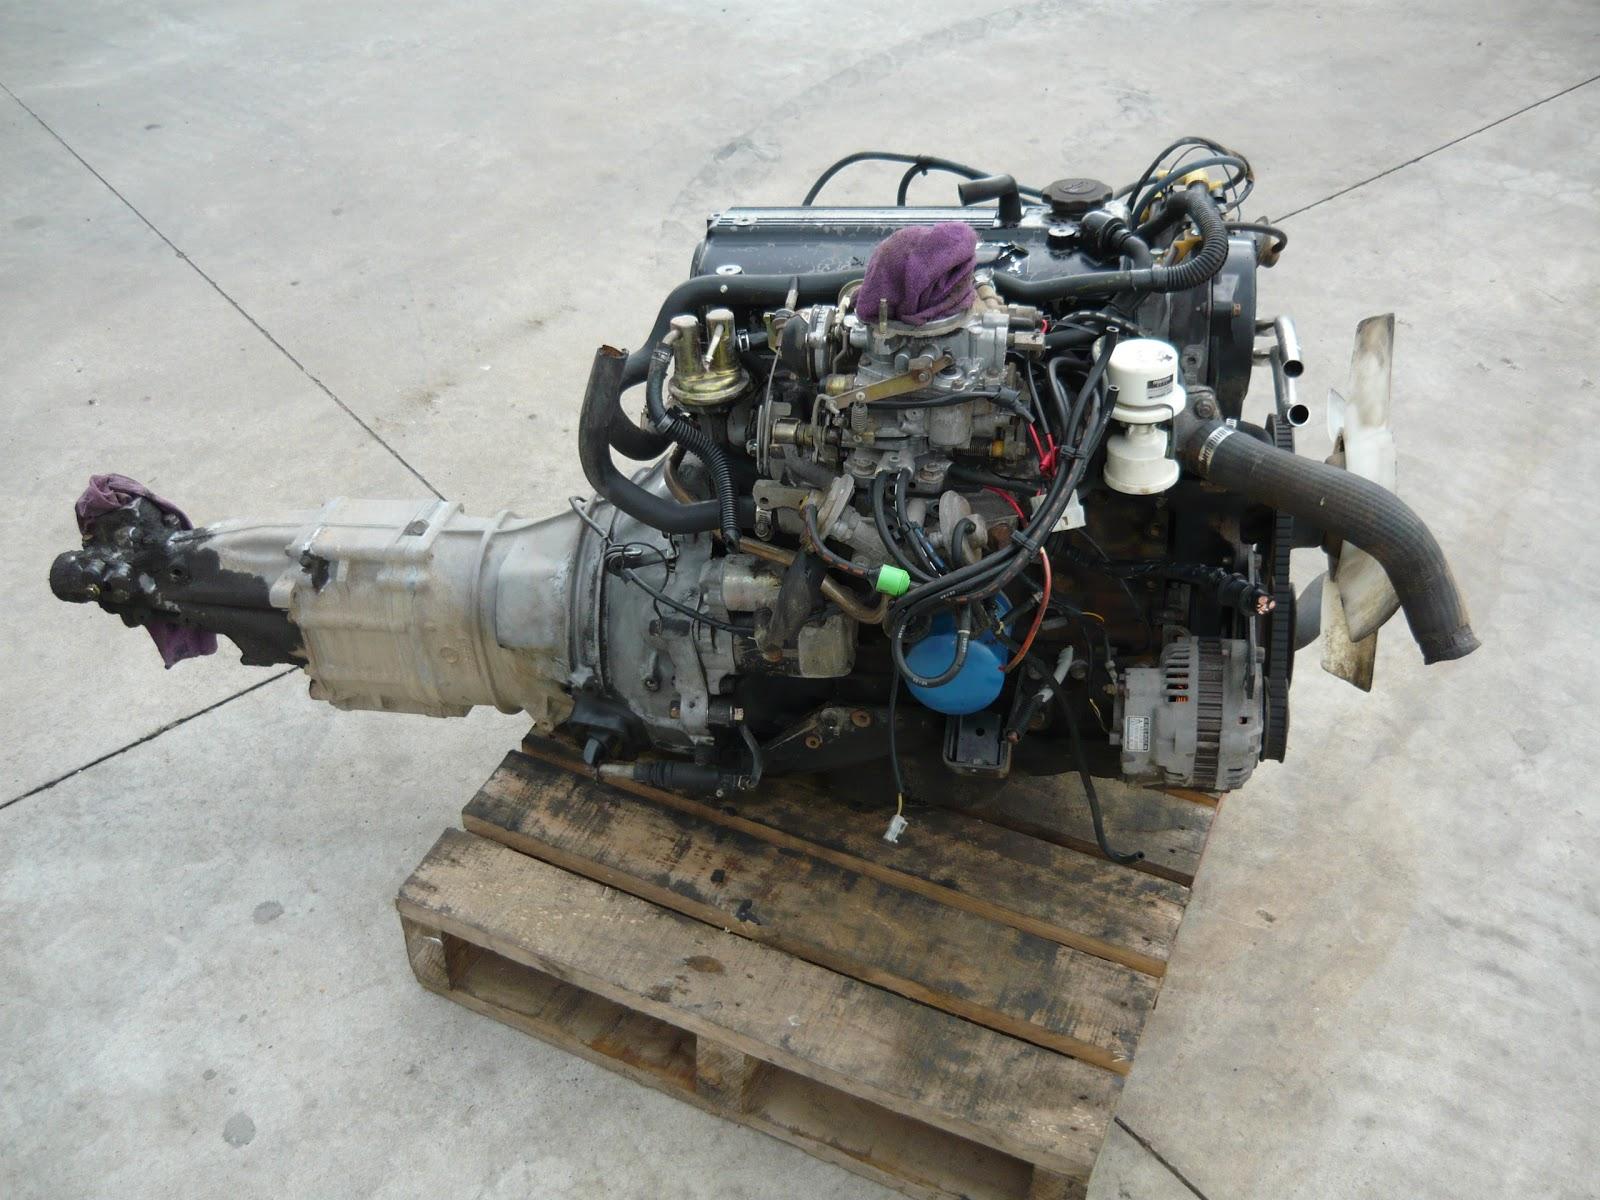 1991 Mazda B2200 Carburetor Adjustment 1990 Rx7 Wiring Diagram Christie Pacific Machinery New And Used Engine For Rh Cpmused Blogspot Com 323 88 Alternator